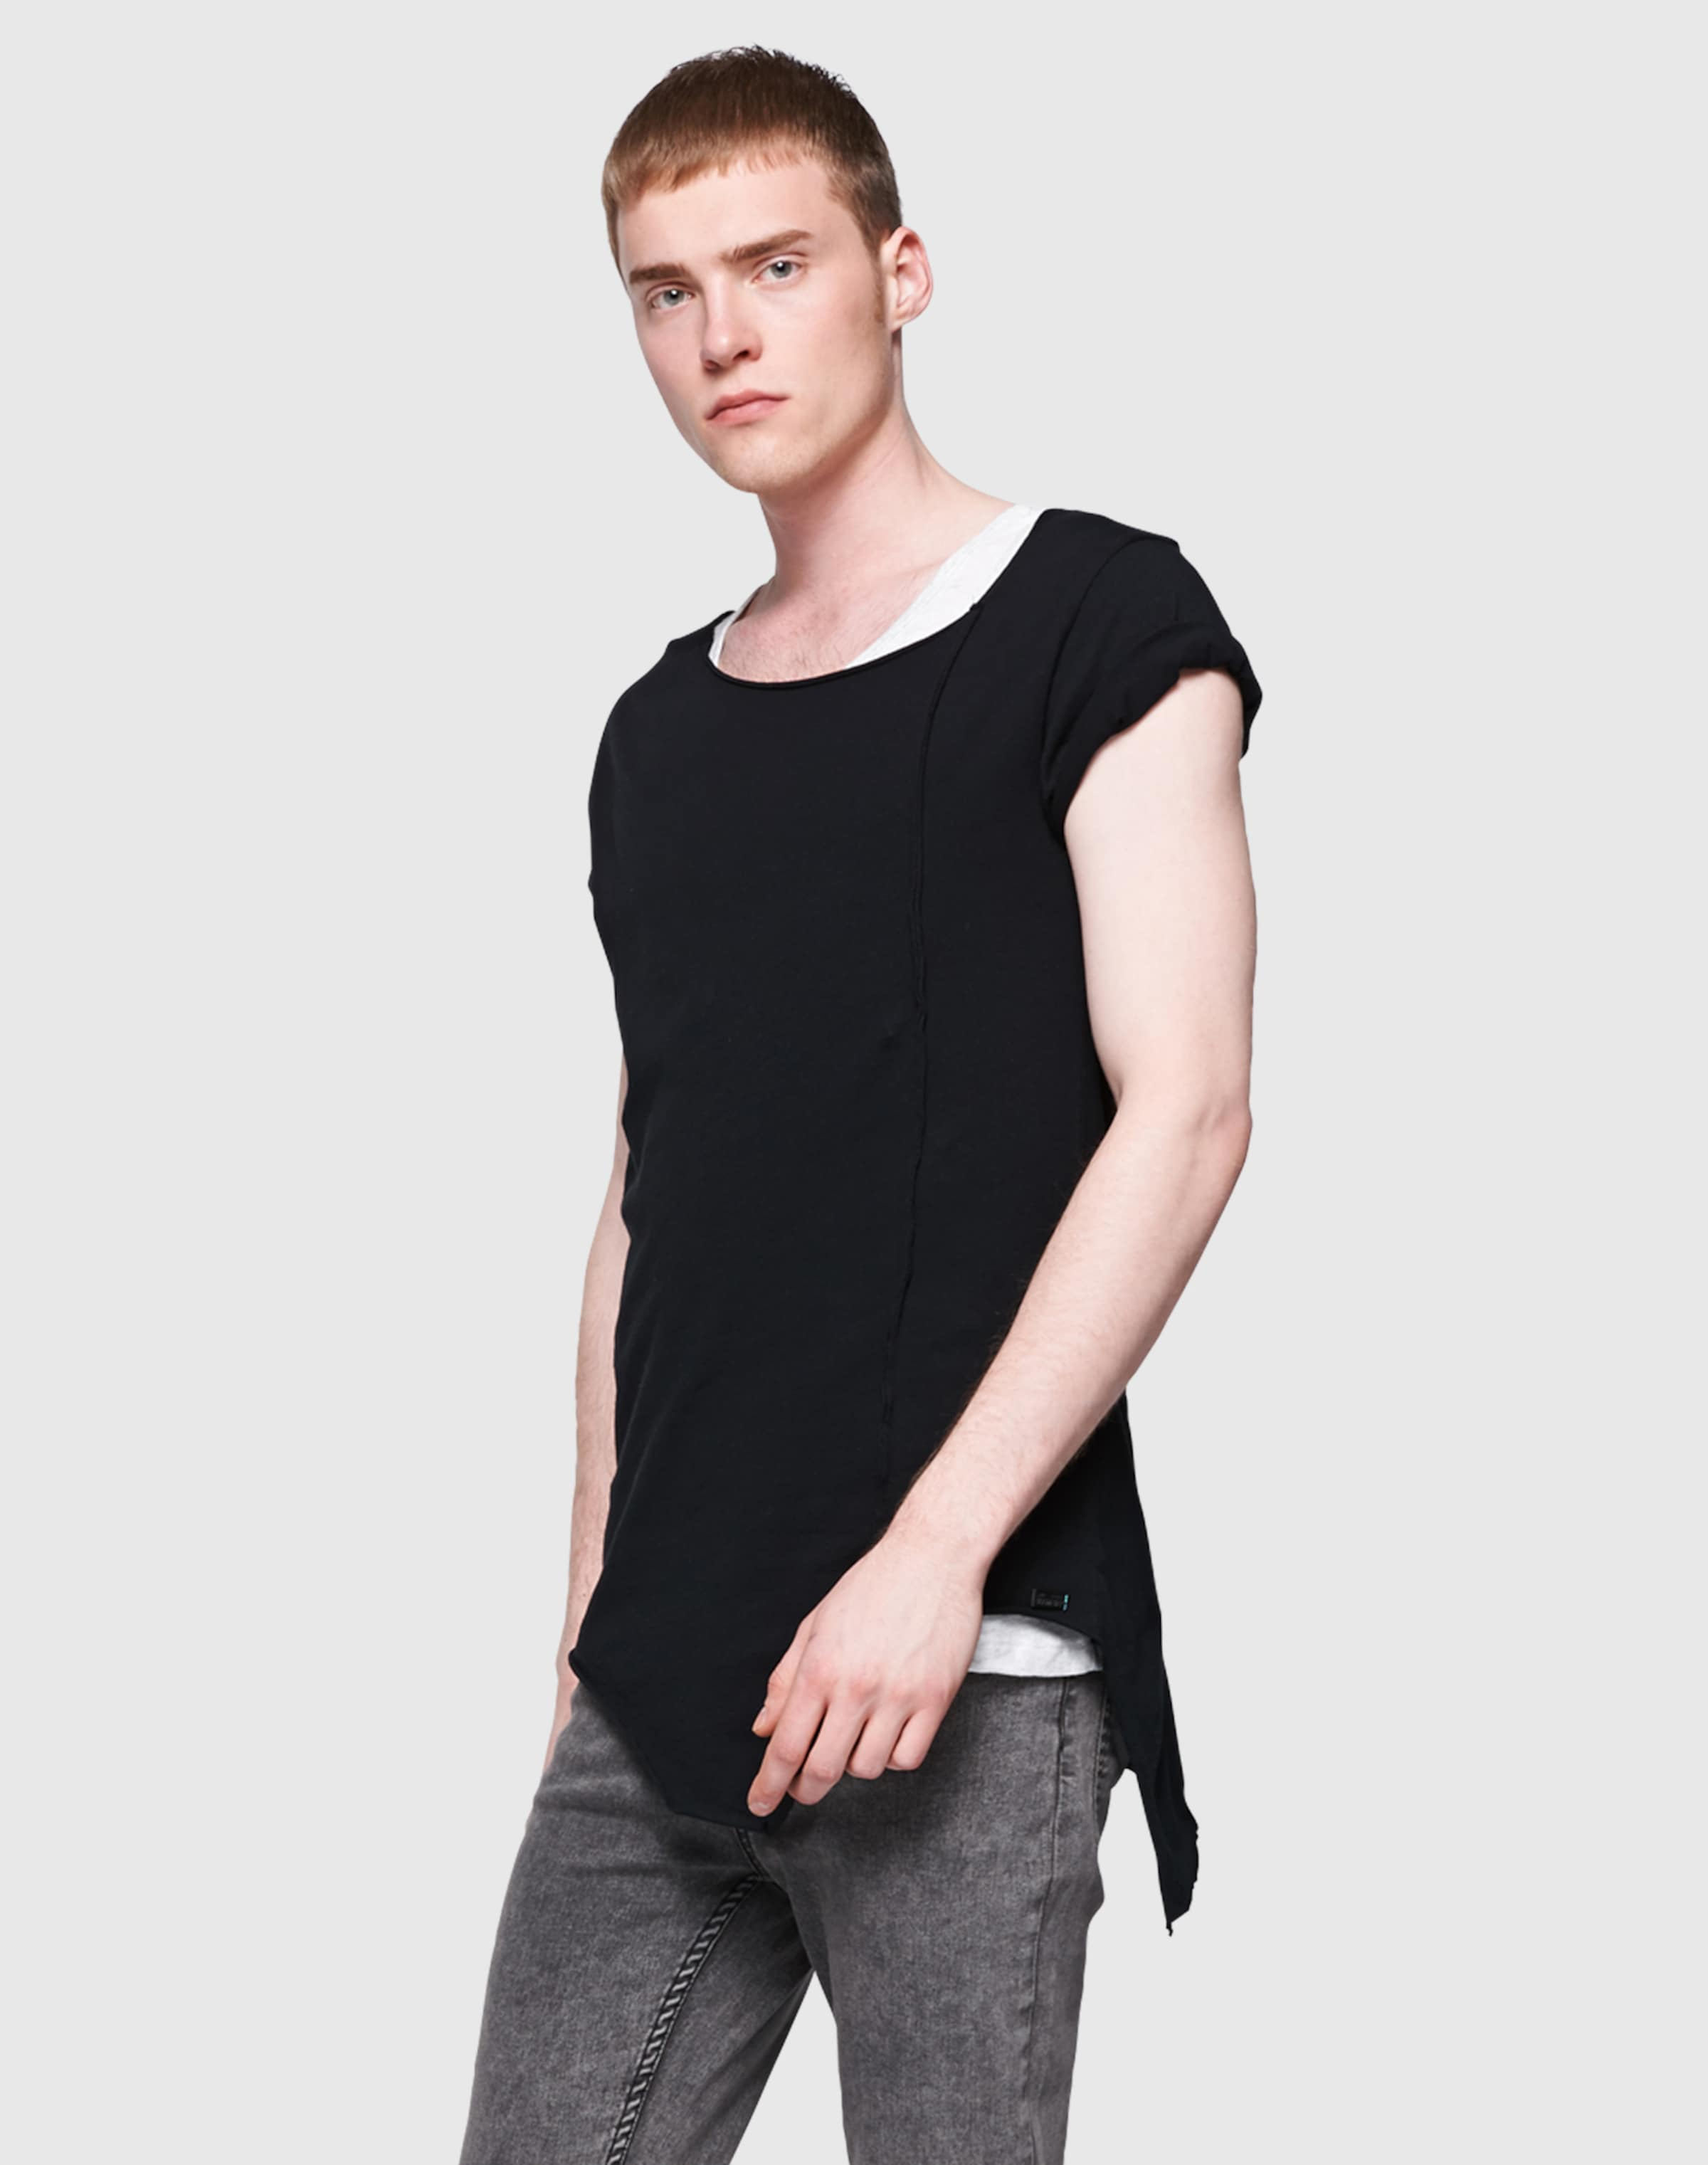 BOOM BAP T-Shirt 'Killer' Freies Verschiffen Bestes Geschäft Zu Bekommen oecqbuB